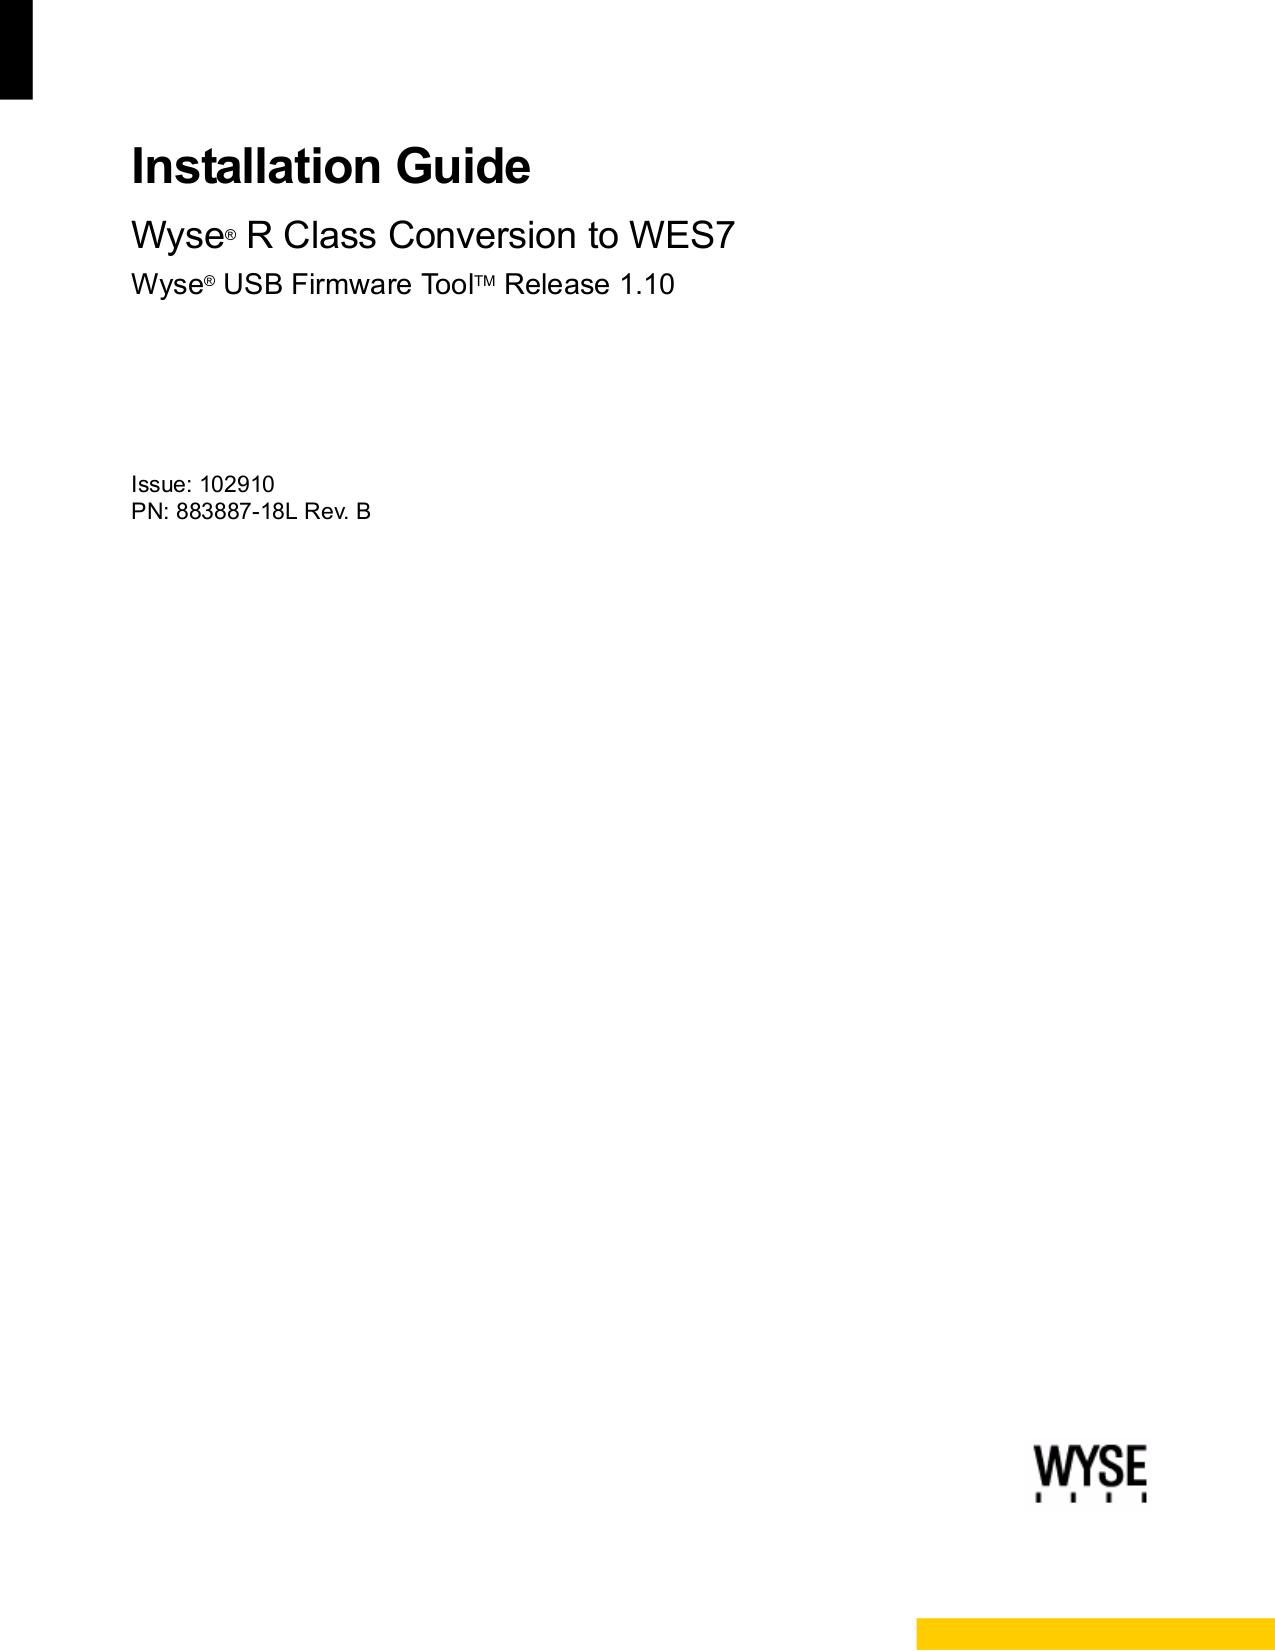 pdf for Wyse Desktop R90L manual